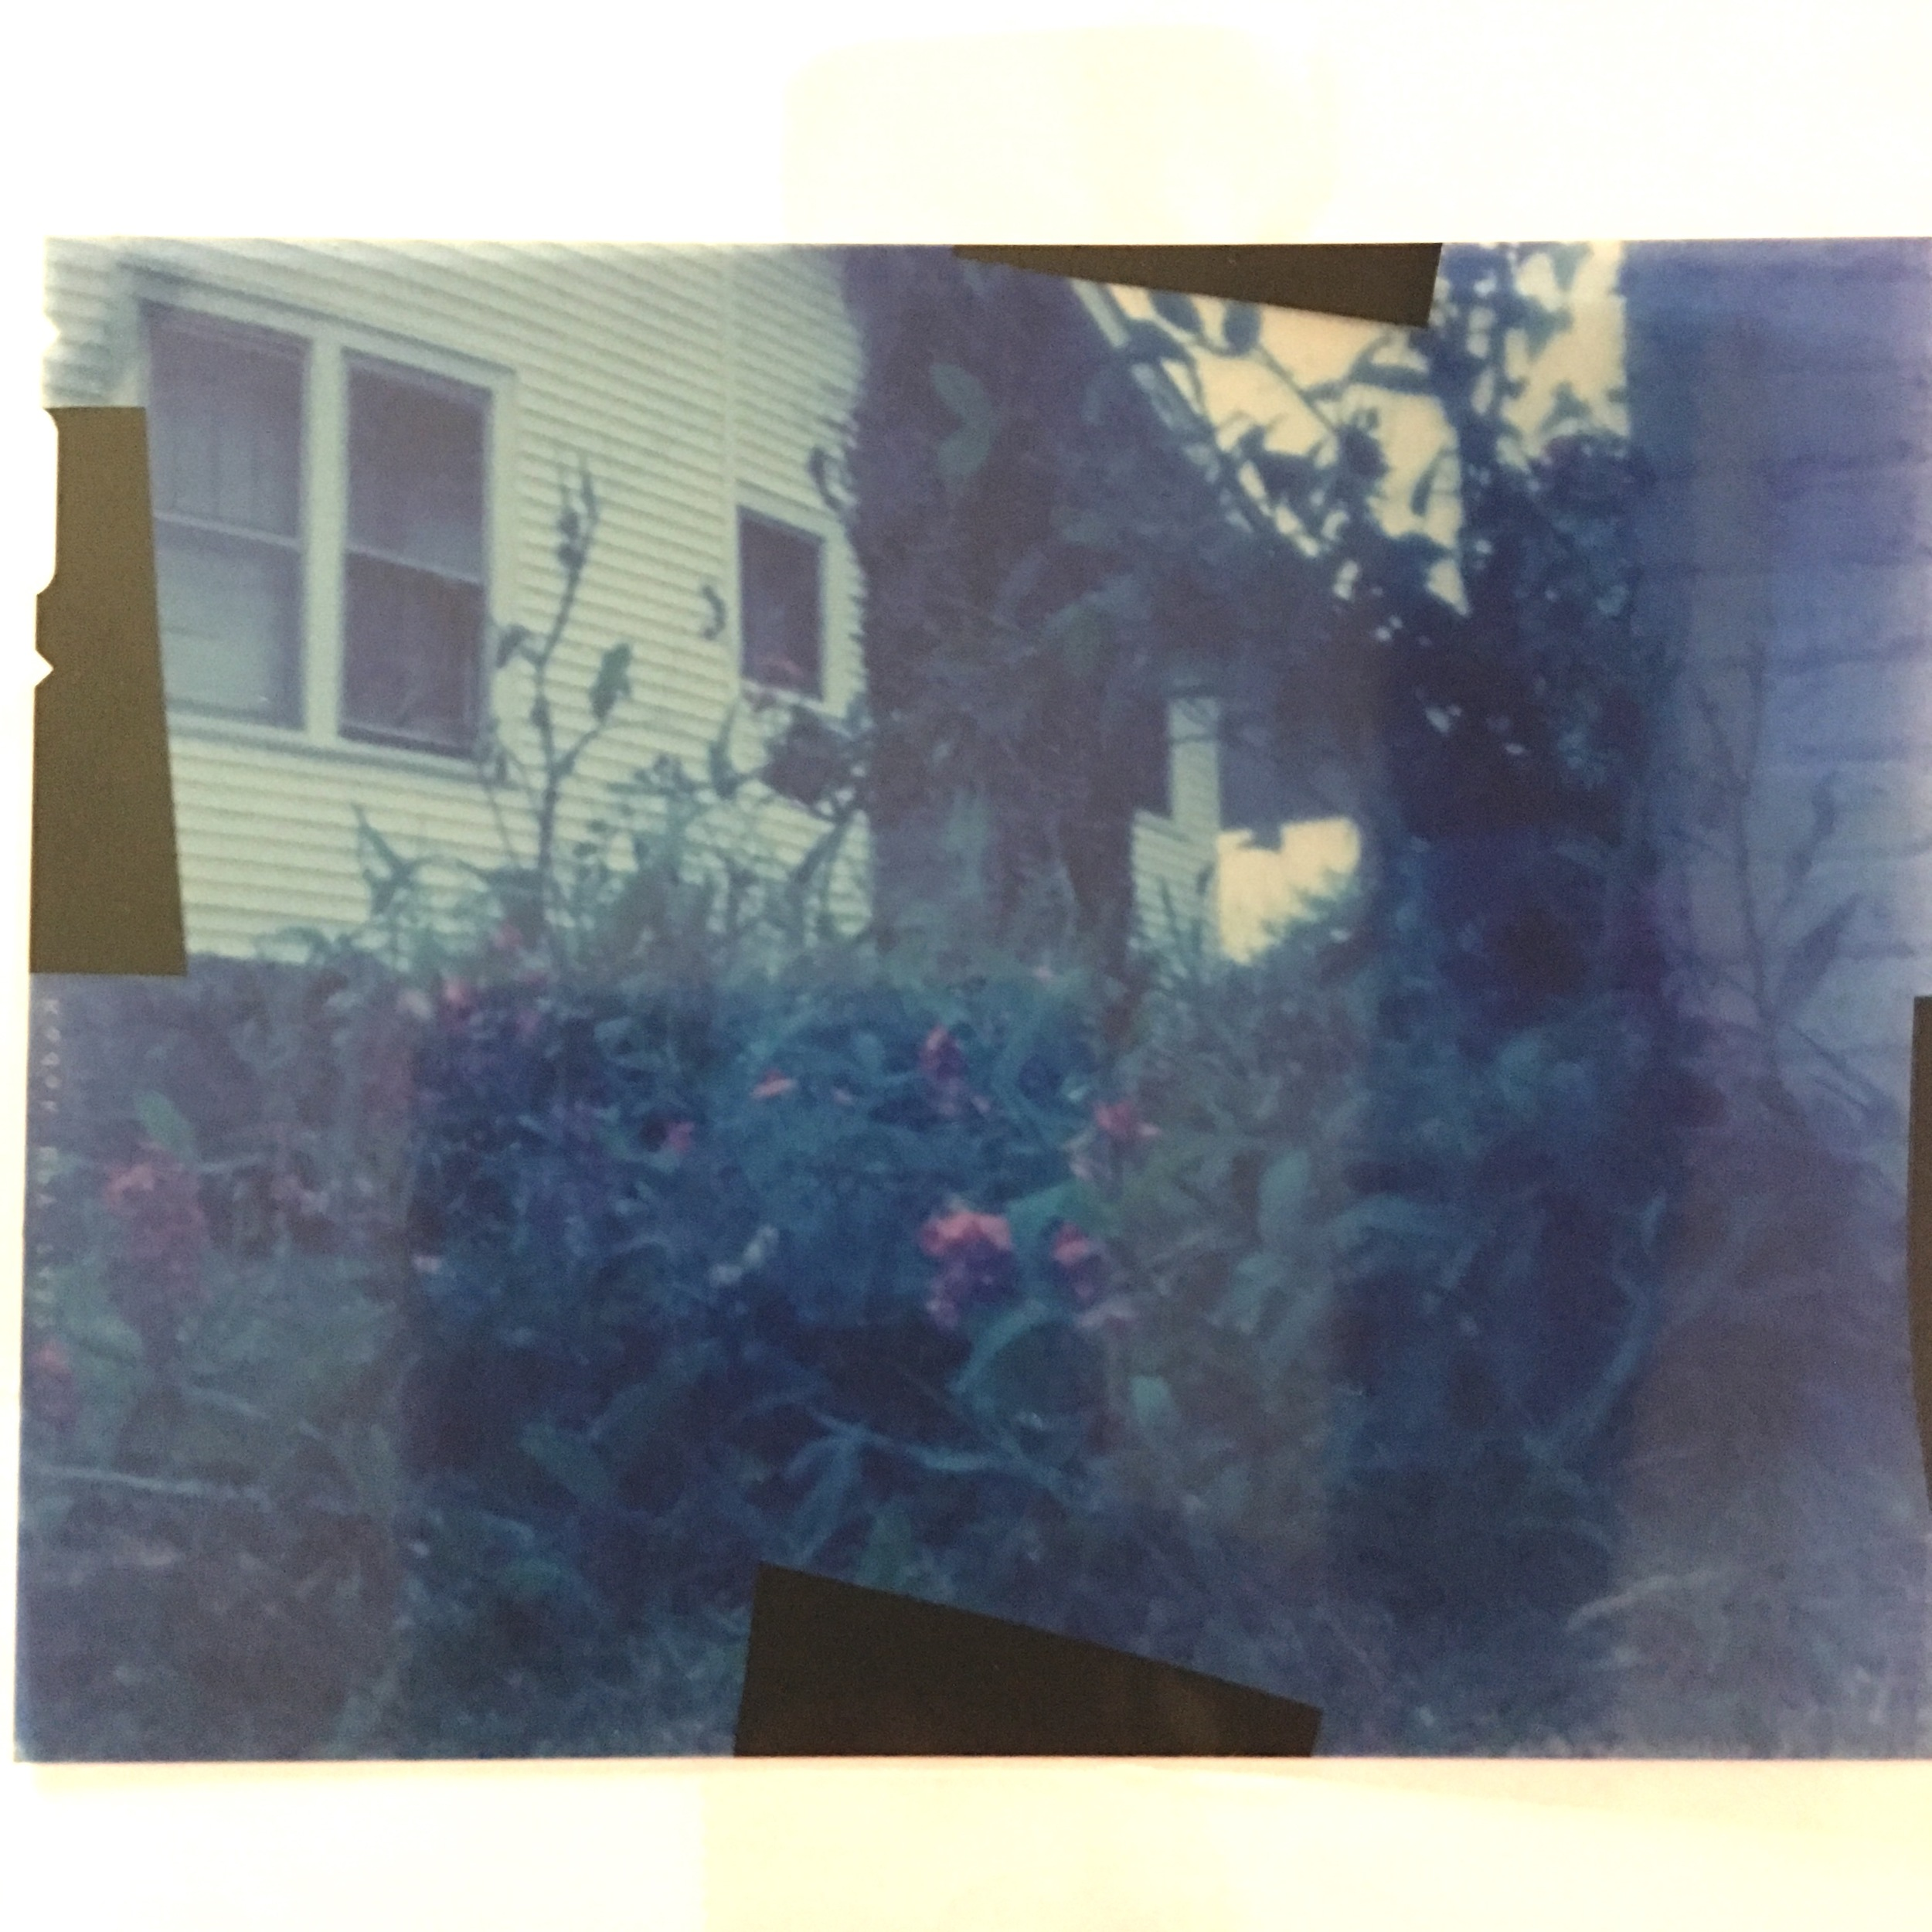 Flowers | Paint Can Pinhole | Expired Ektachrome 4x5 | Ozzy